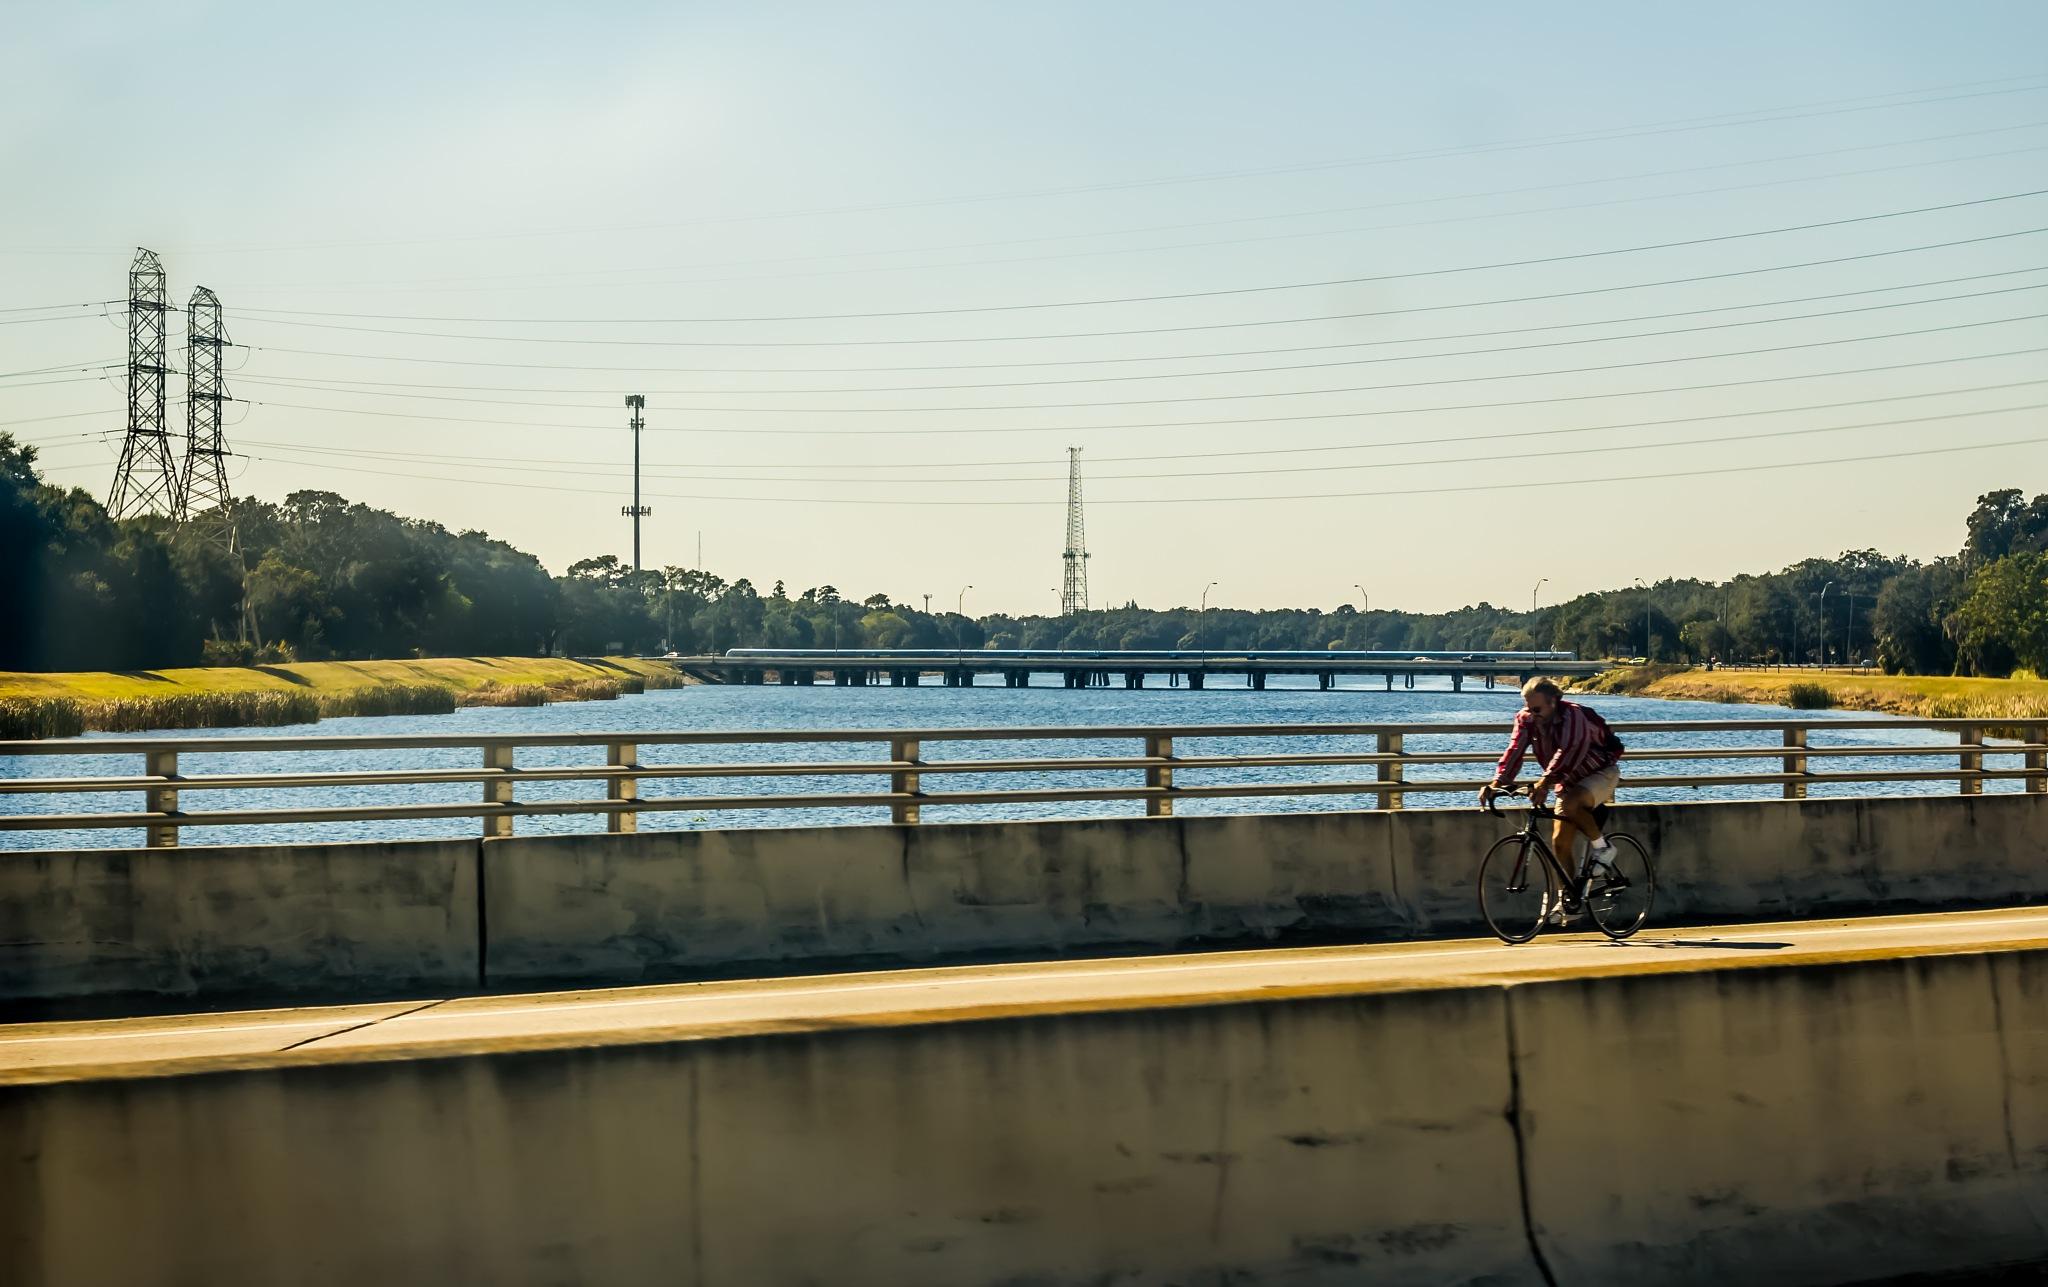 morning bike ride by Linda Hammad